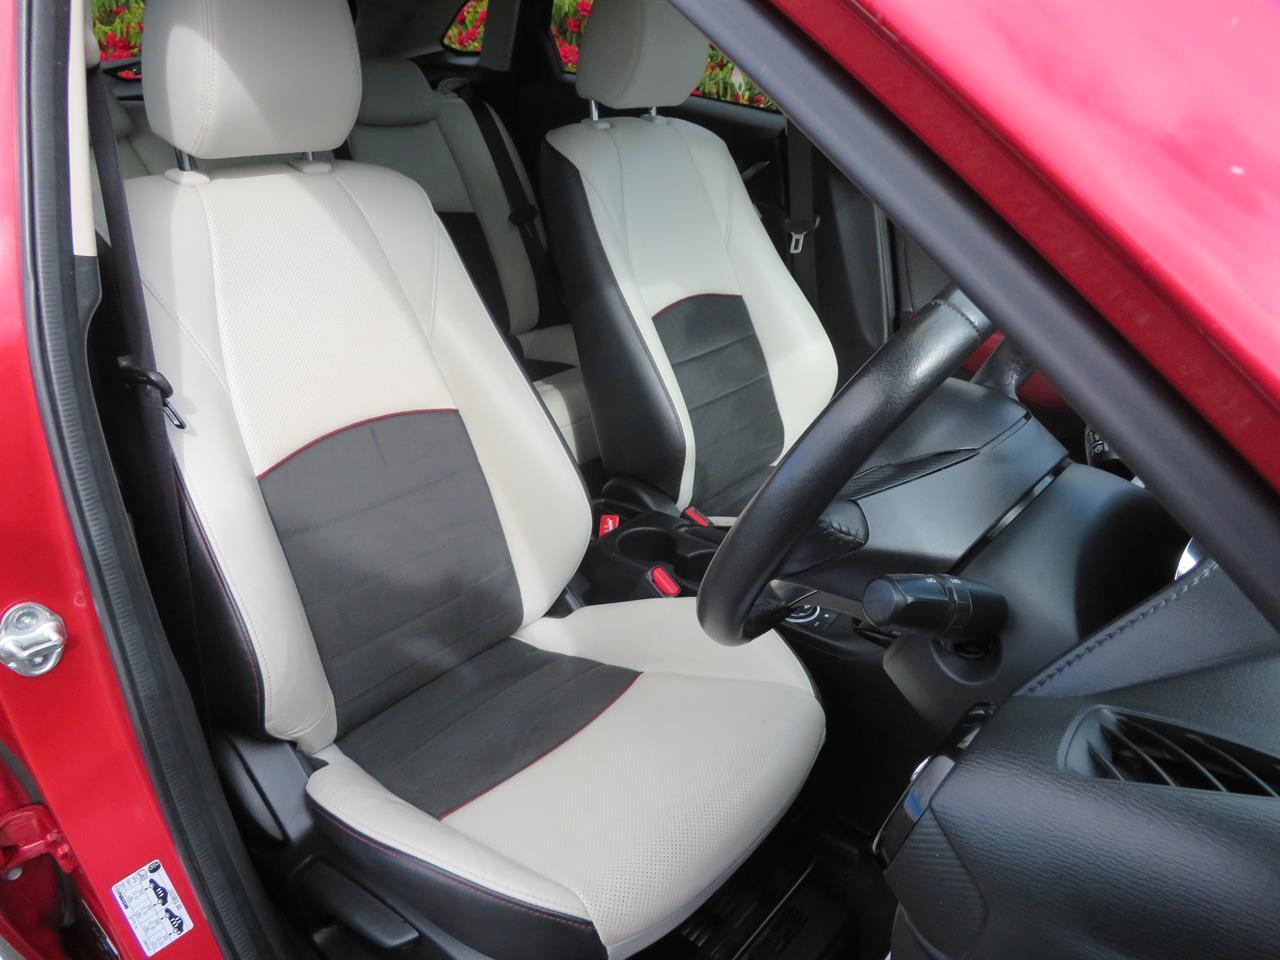 image-16, 2015 Mazda CX-3 LTD AWD at Gore